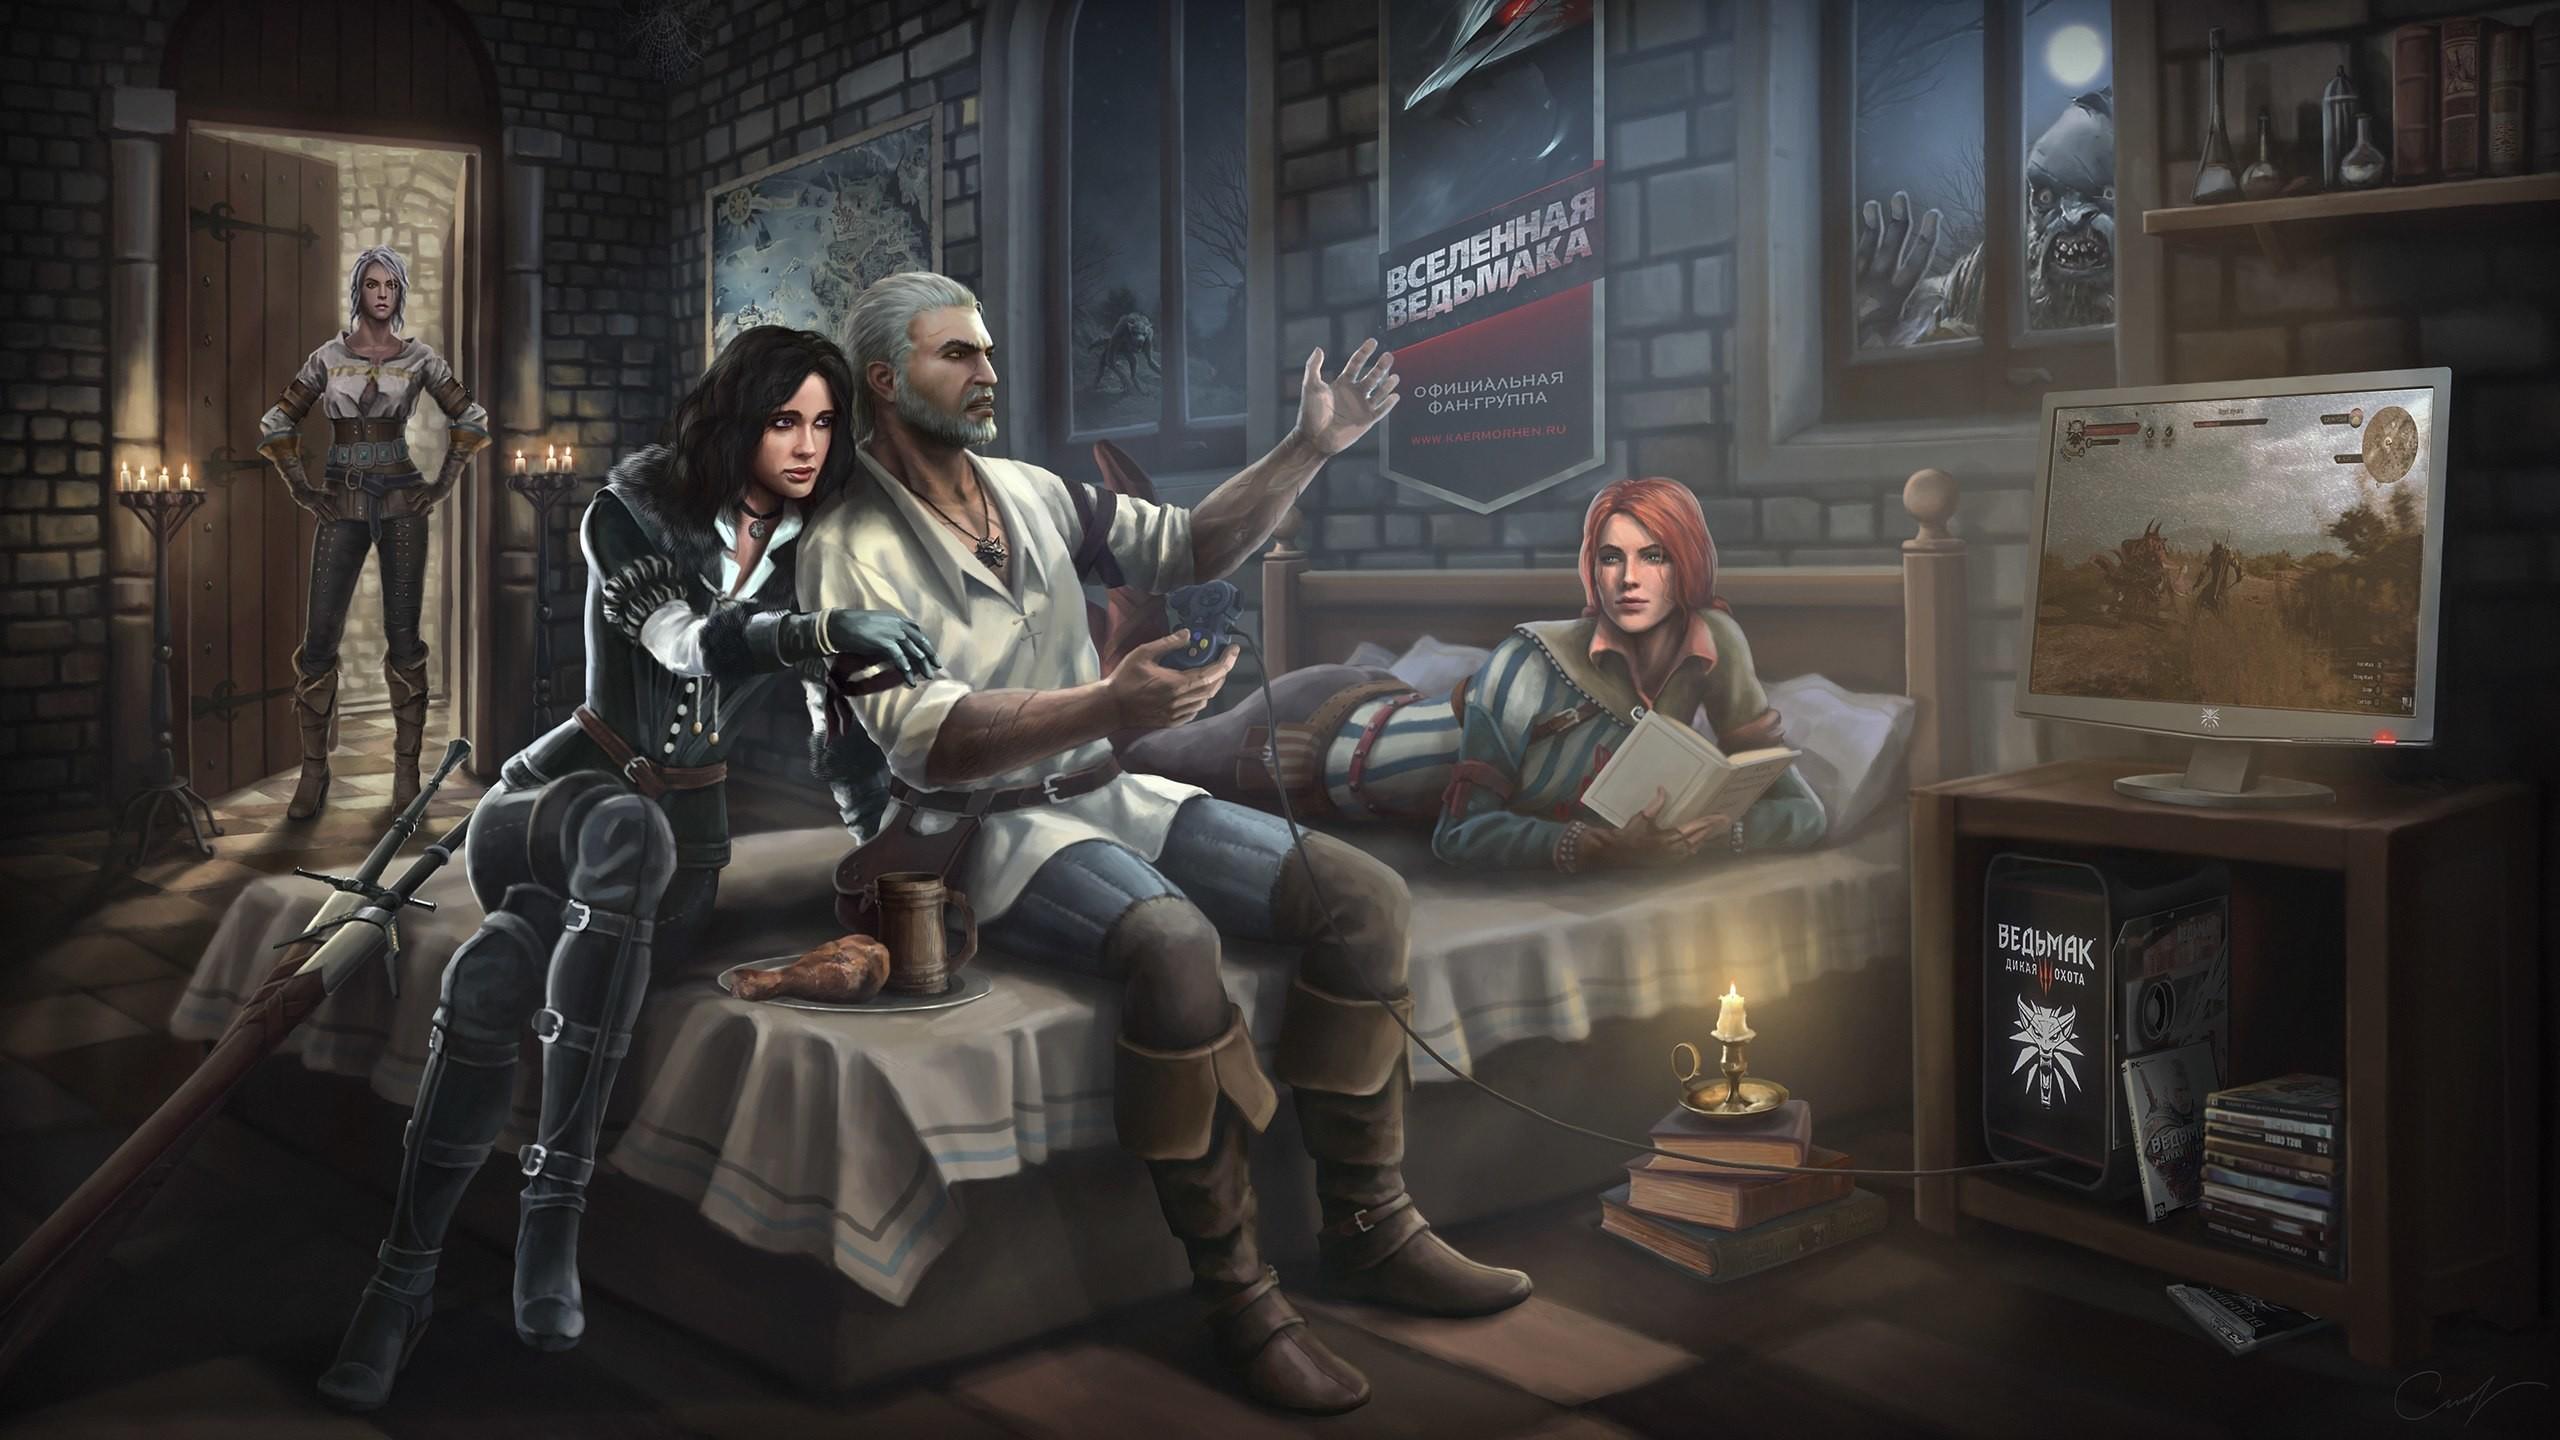 The-Witcher-3-Wild-Hunt-Gentral-HD-Wallpaper.jpg (JPEG obrázek, 2560 × 1440  bodů) – Měřítko (65%)   Witcher 3 Wild Hunt   Pinterest   Wild hunt and …